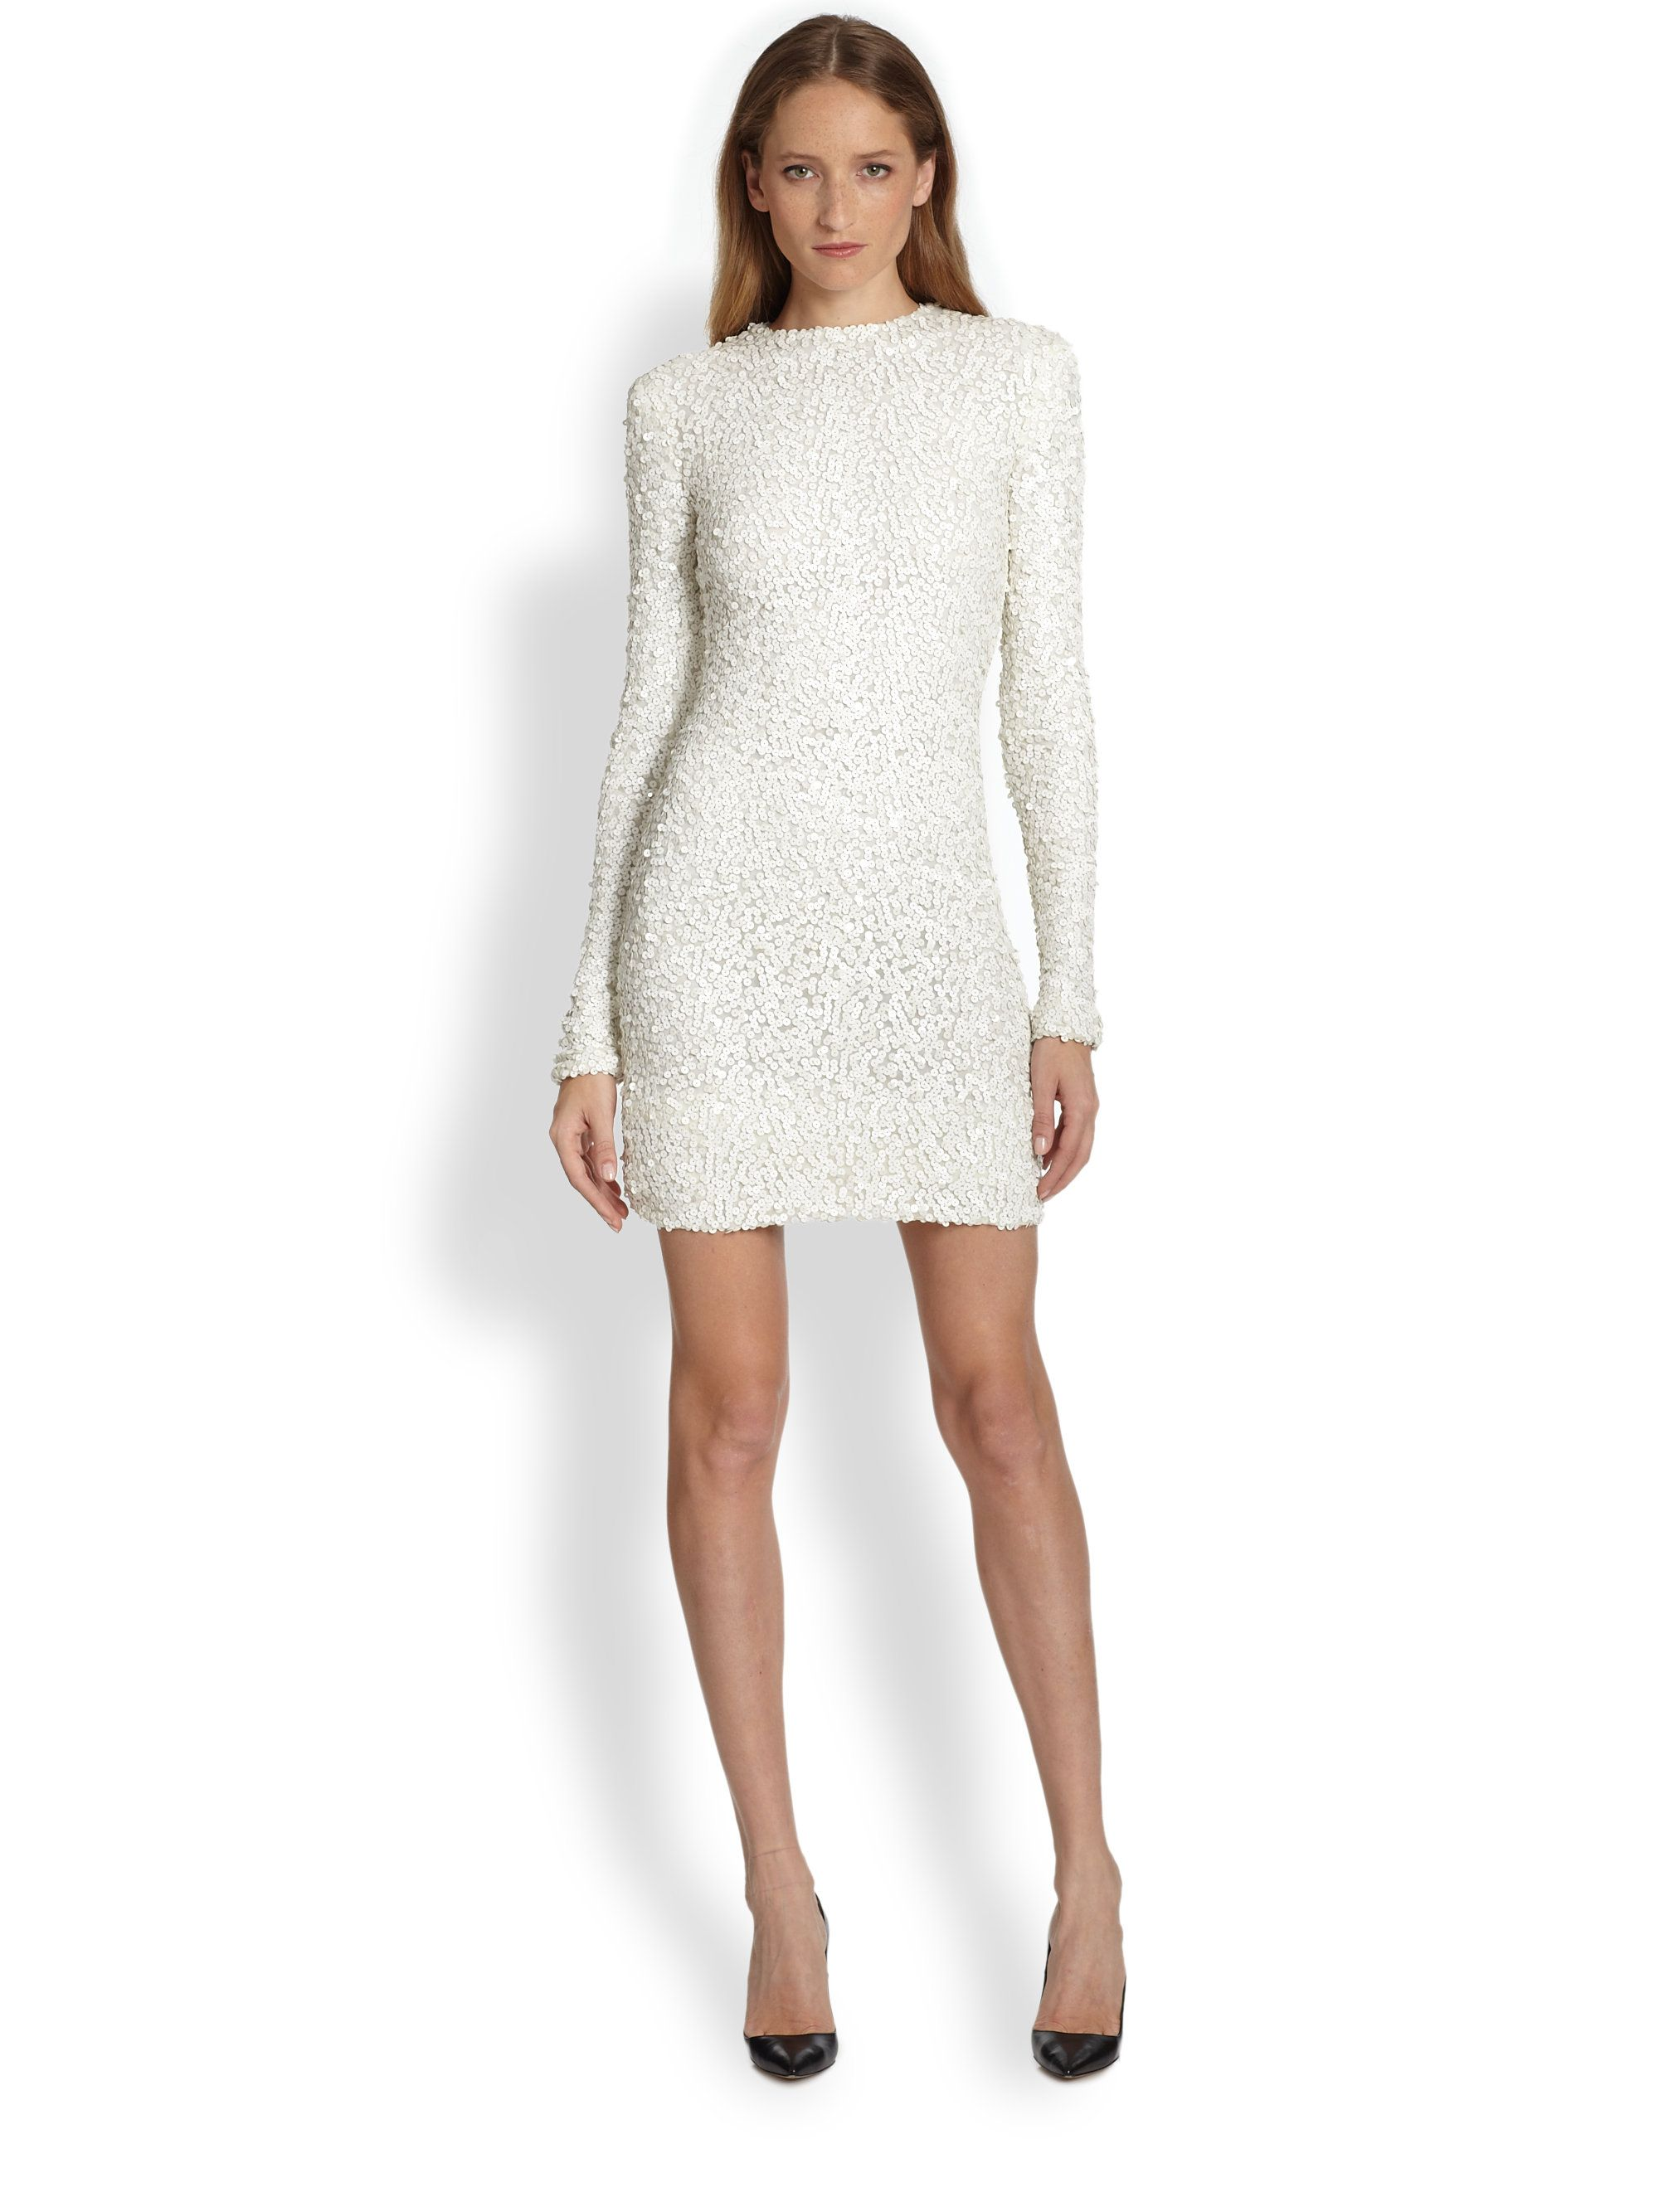 Rachel Zoe White Adrienne Leathersequin Sheath Dress Elegant Dresses Short White Leather Dress Sequin Dress [ 2667 x 2000 Pixel ]